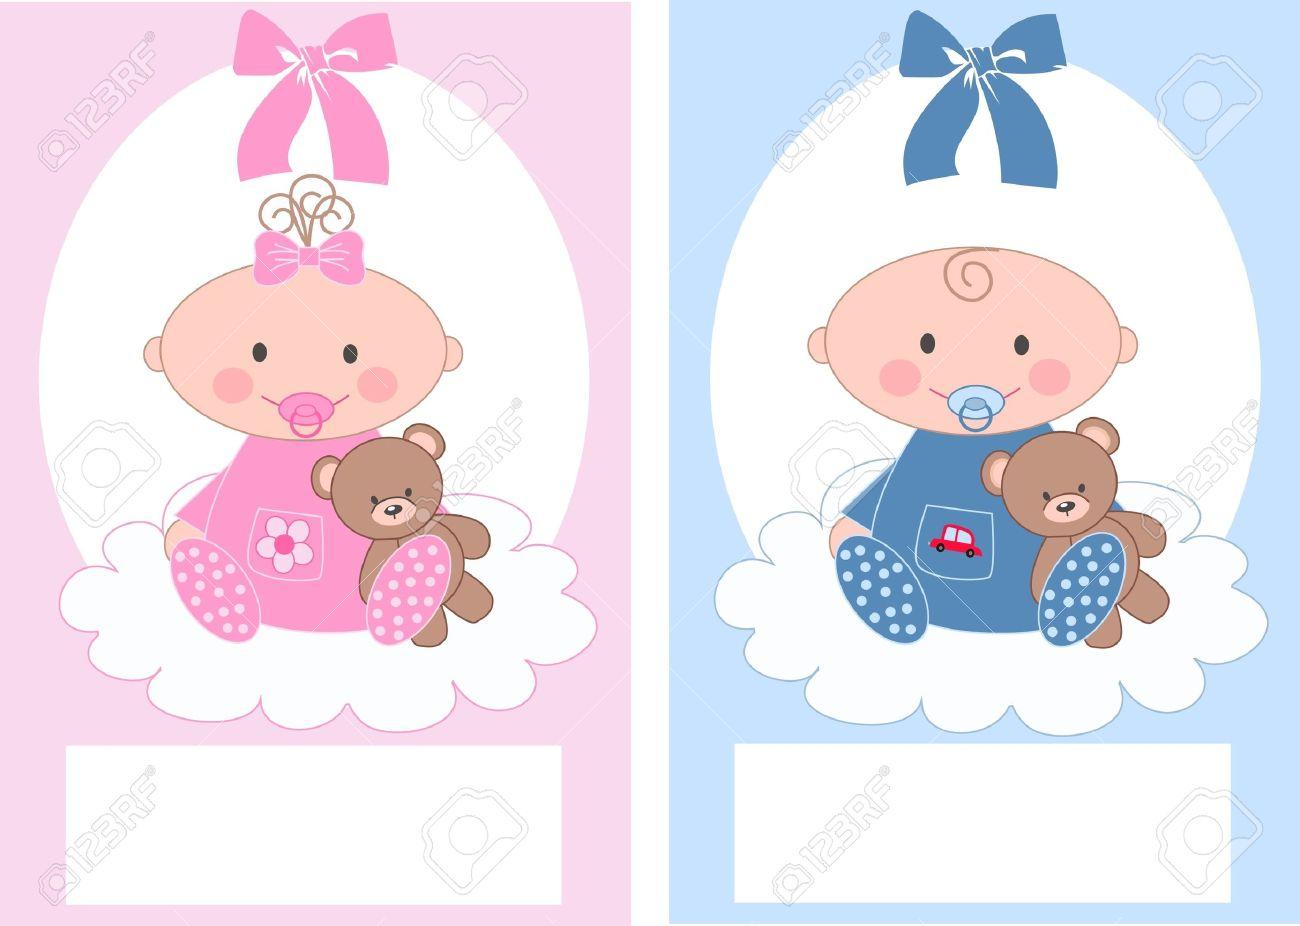 Immagini Auguri Nascita Di Un Bambino.Frasi Di Auguri Per La Nascita Di Un Bambino O Di Una Bambina